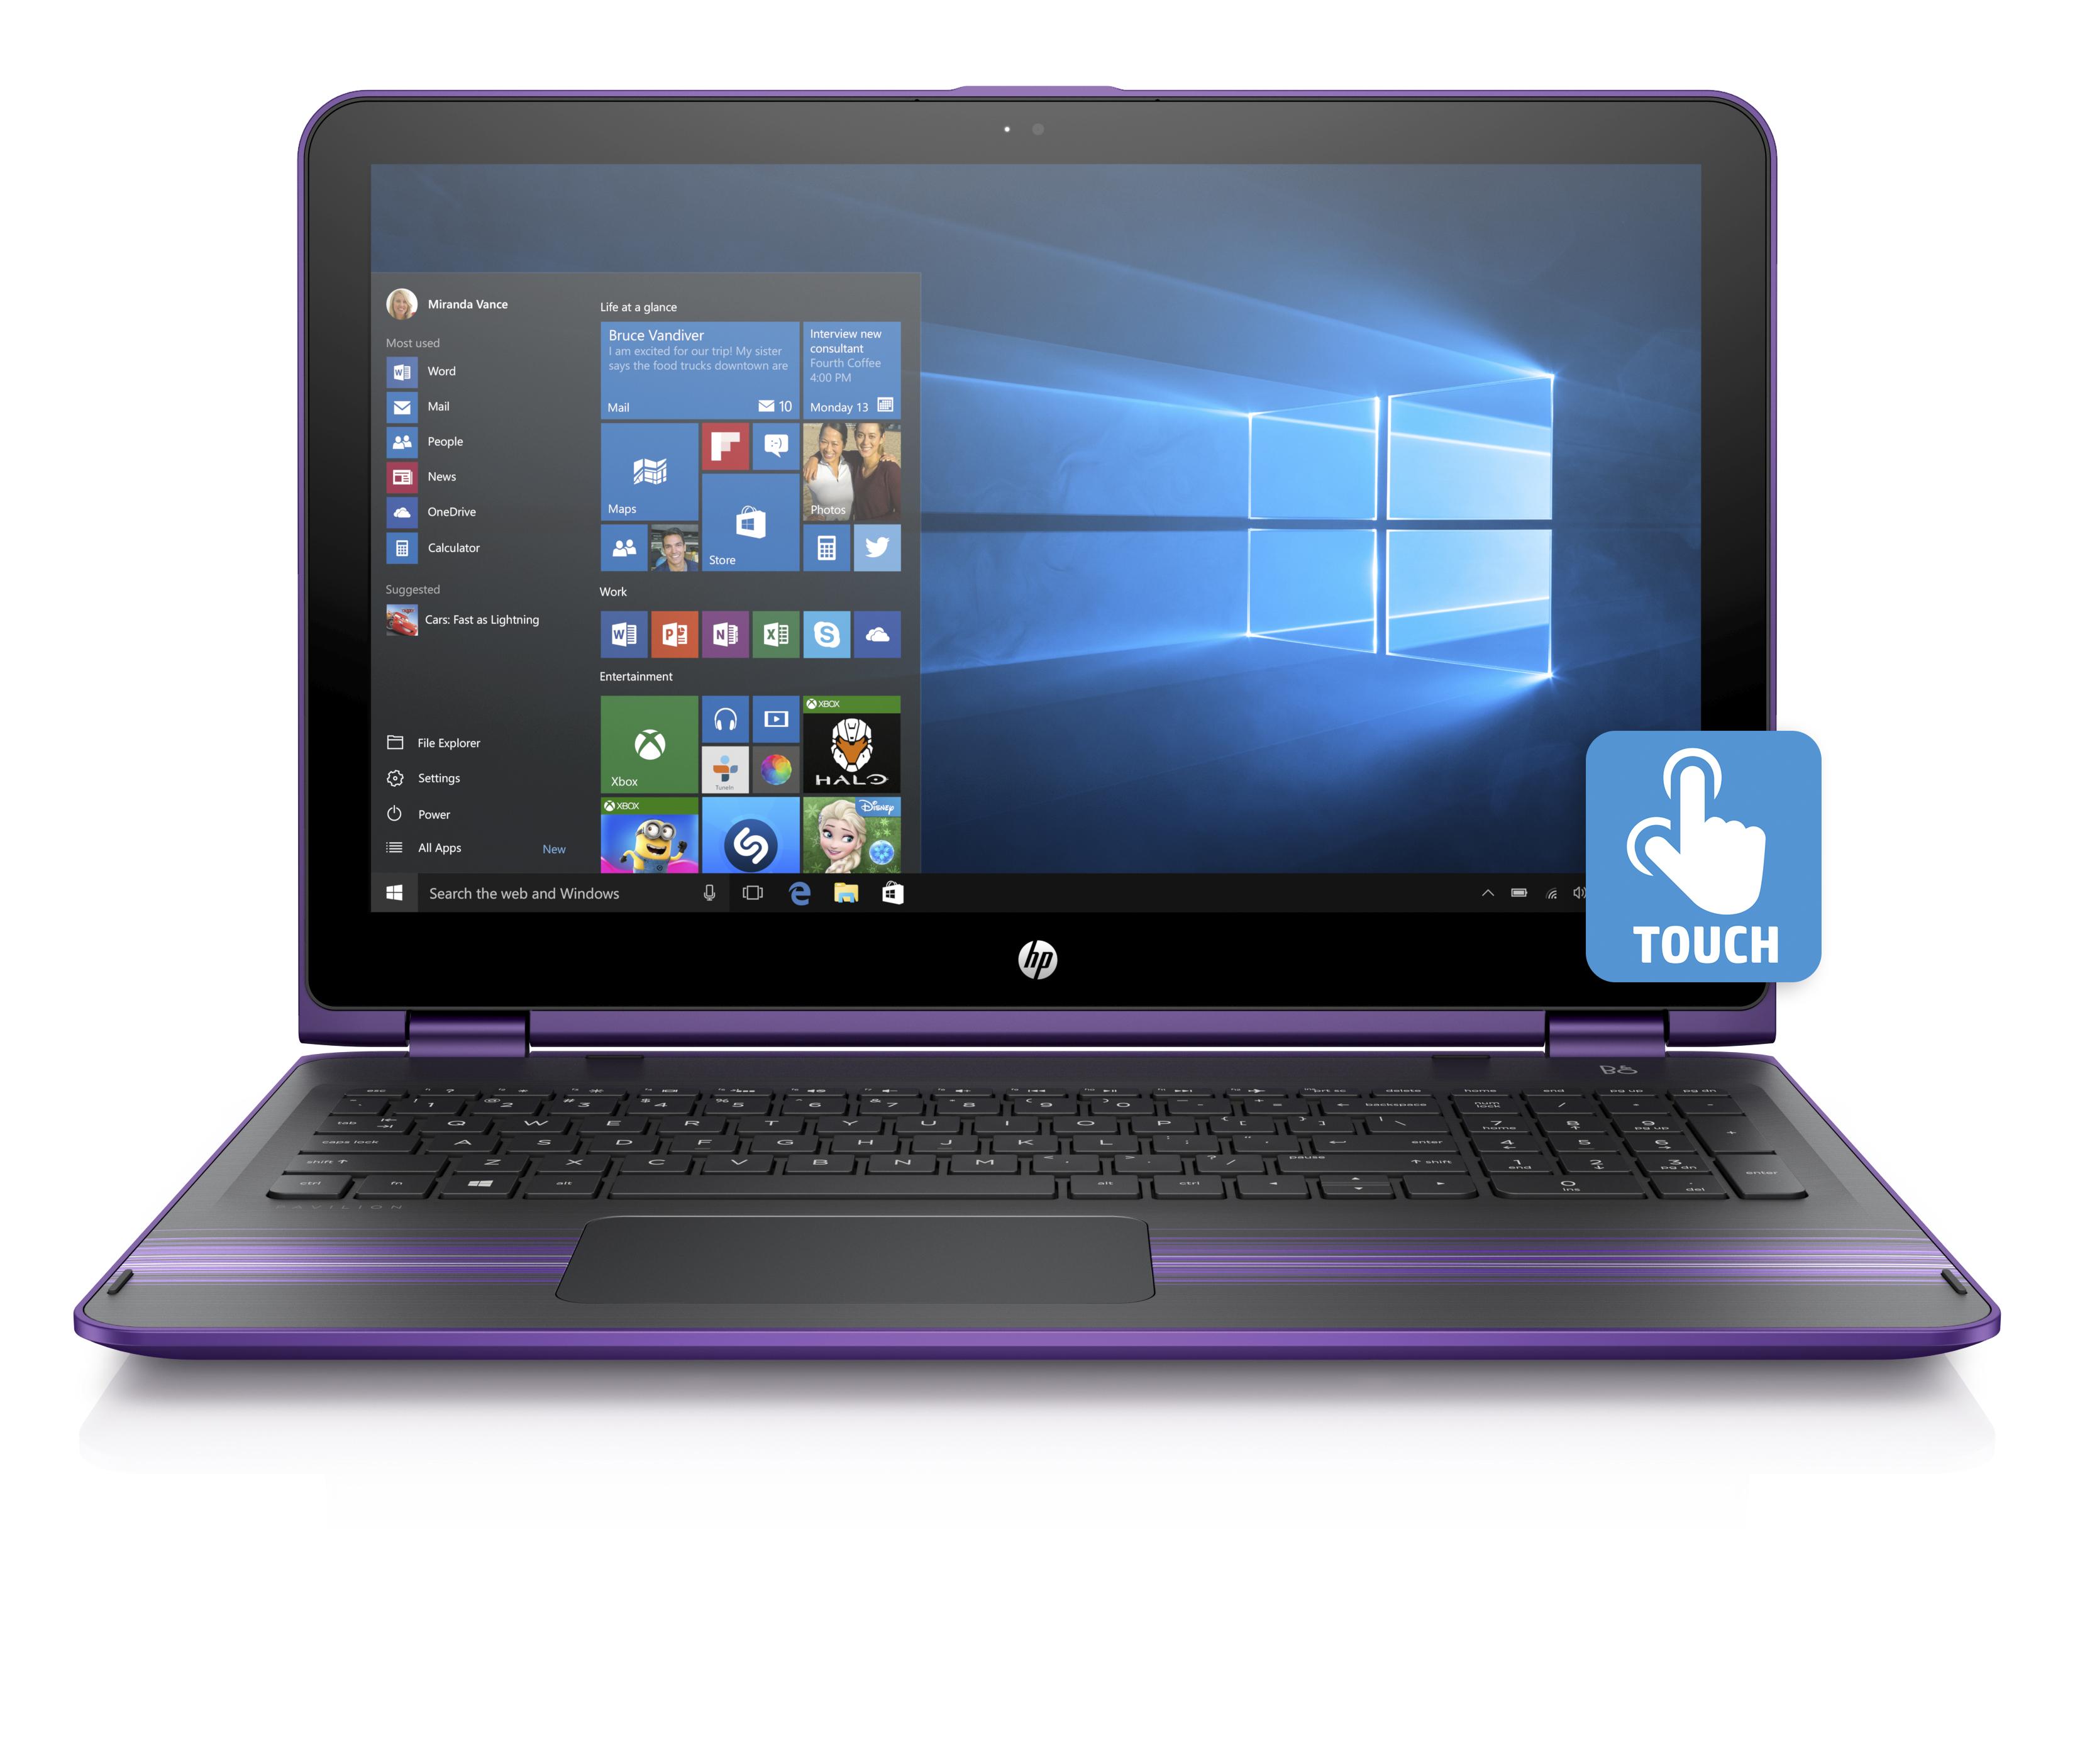 HP back to school slideshow 3 - HP Pavilion x360 15.6_Sport Purple_Front Facing